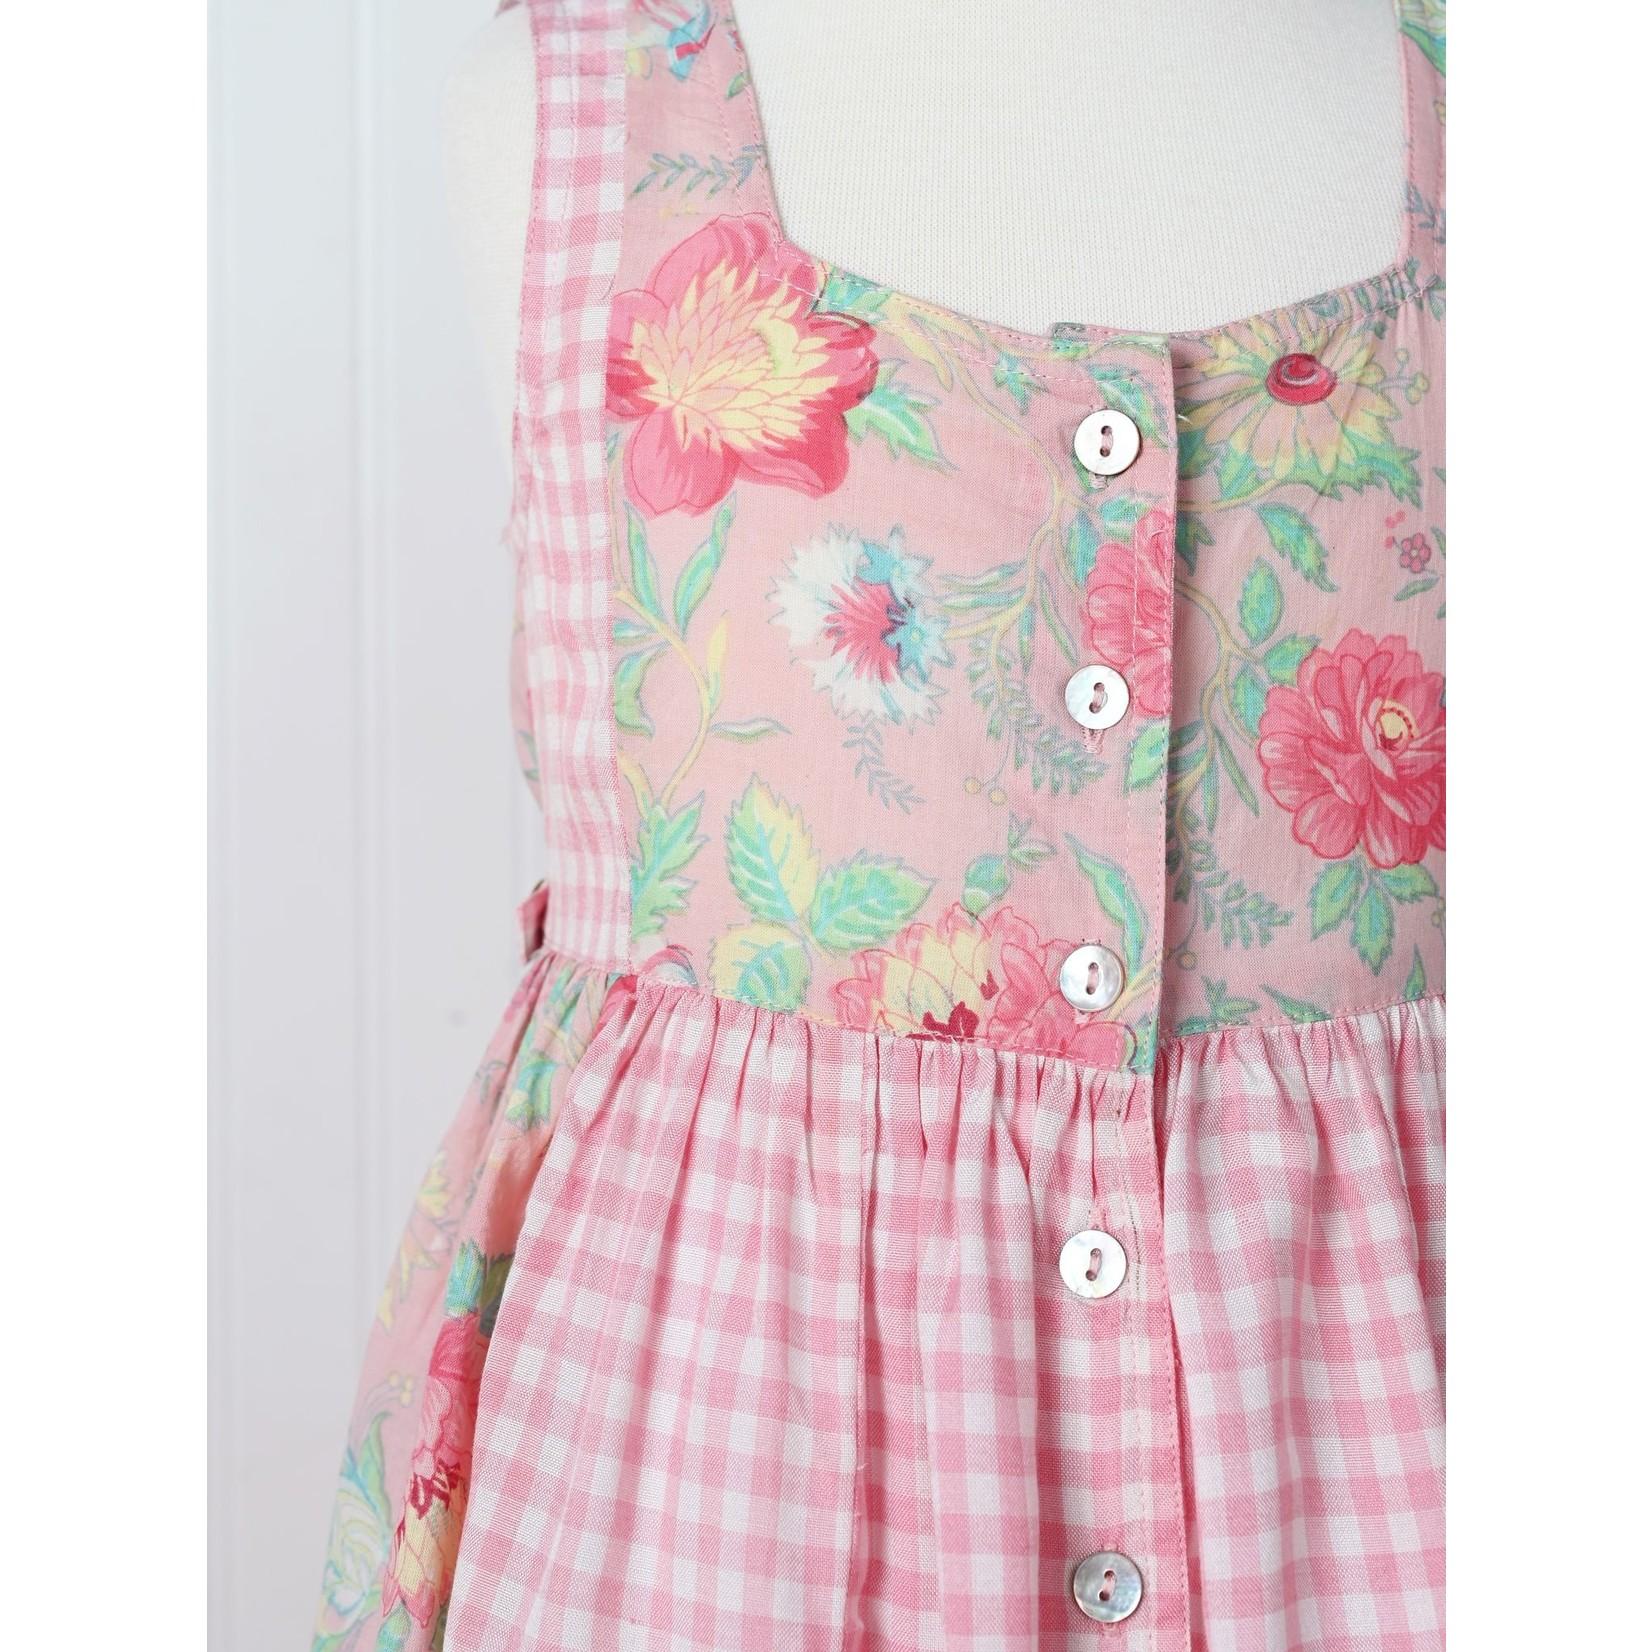 April Cornell Parfait Girls Dress